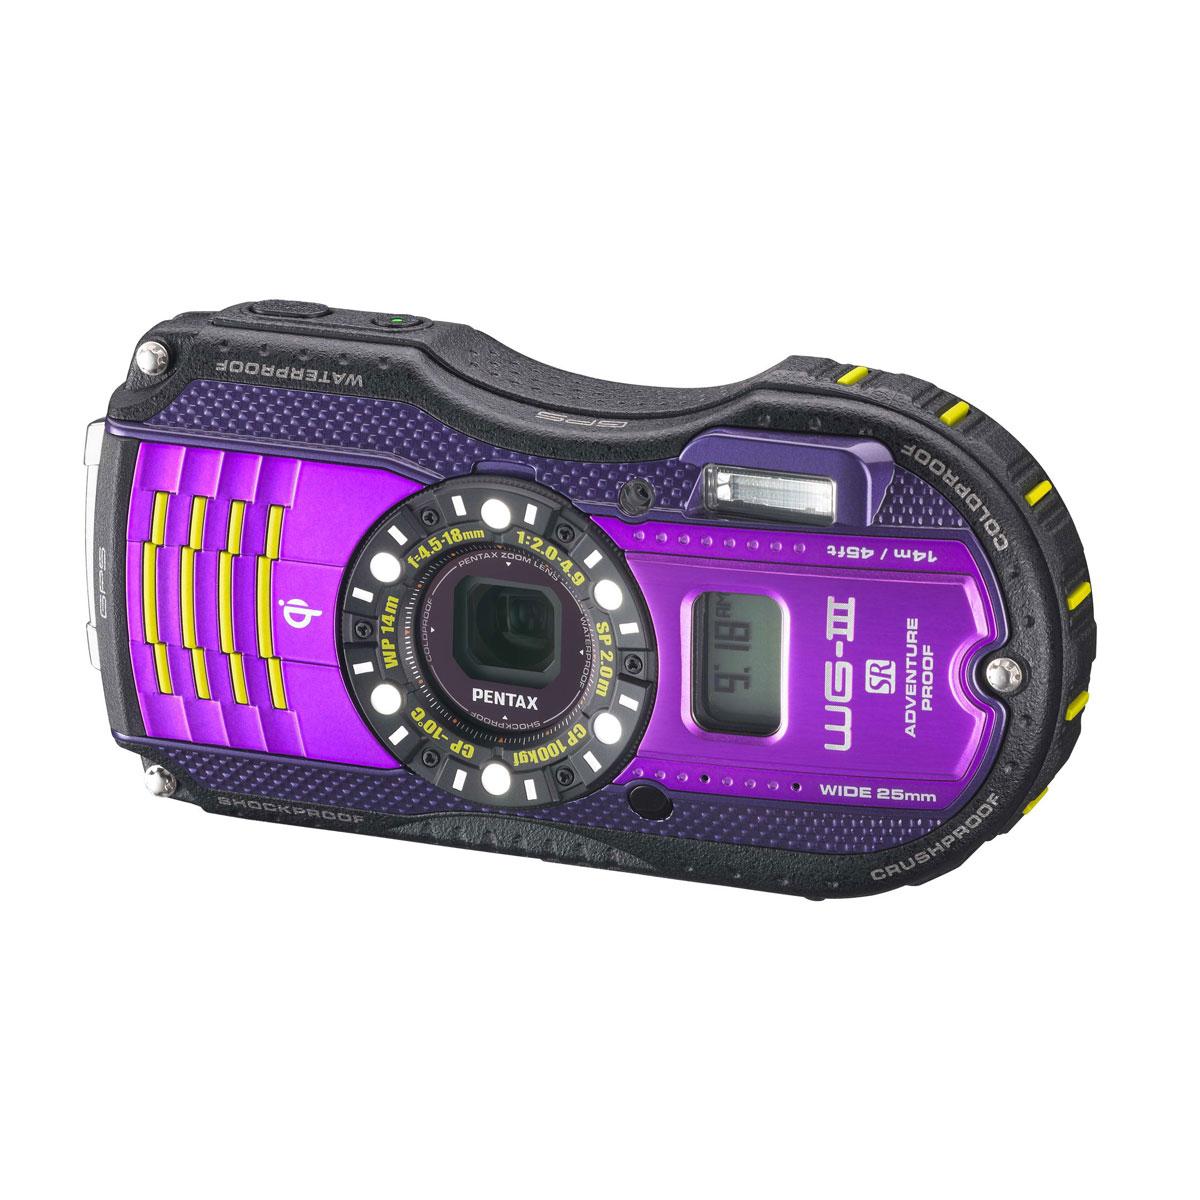 Appareil photo numérique Pentax Optio WG3-GPS Violet Appareil photo baroudeur 16 MP - Zoom grand-angle 4x - Vidéo Full HD - GPS